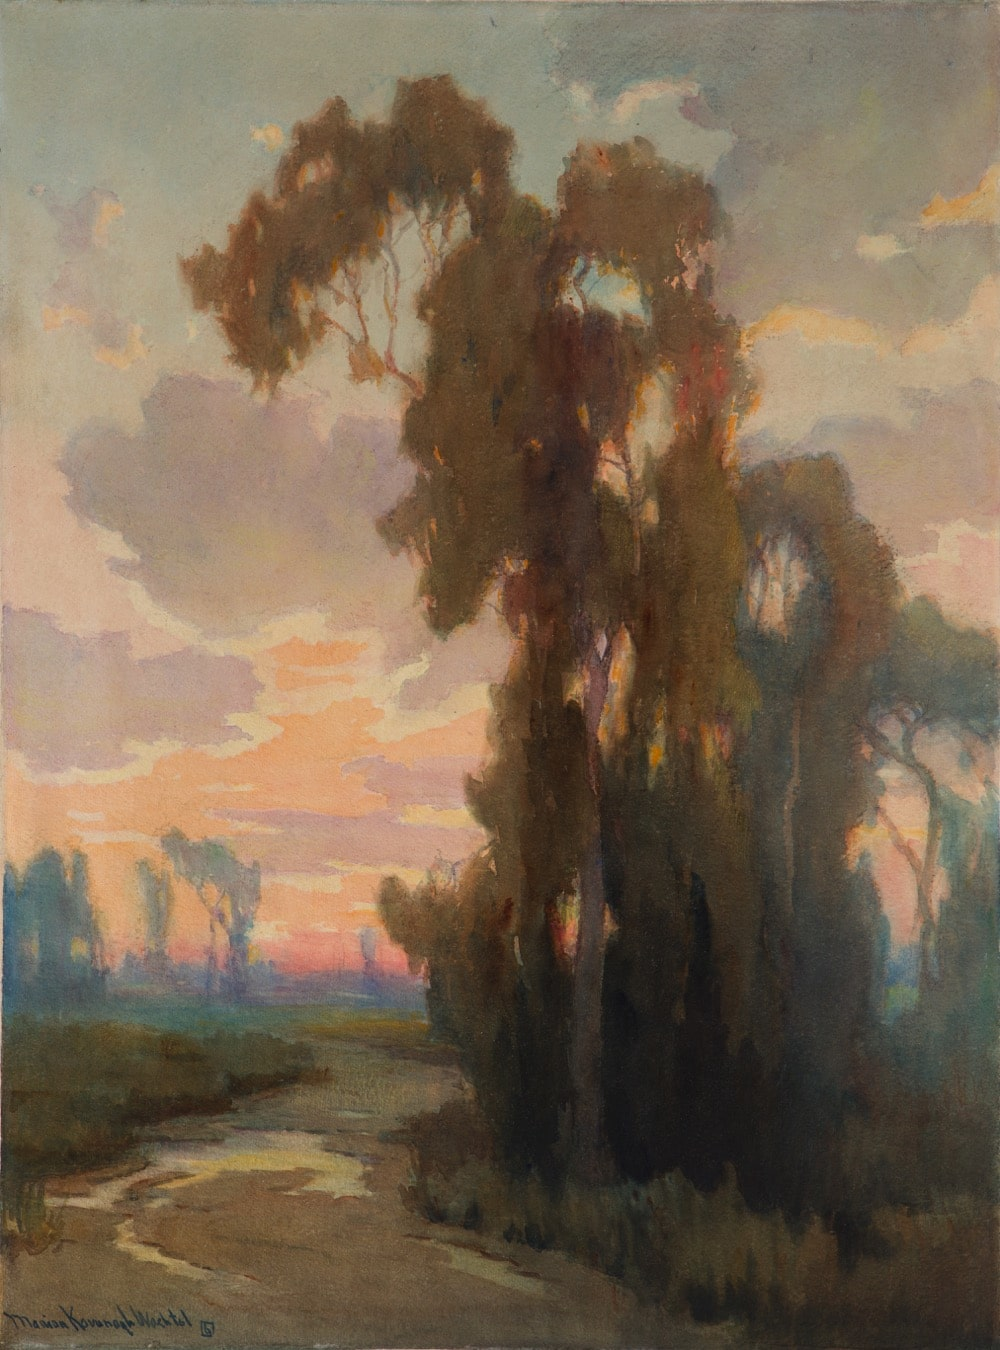 Marion Kavanagh Wachtel (1870-1954 Pasadena, CA)